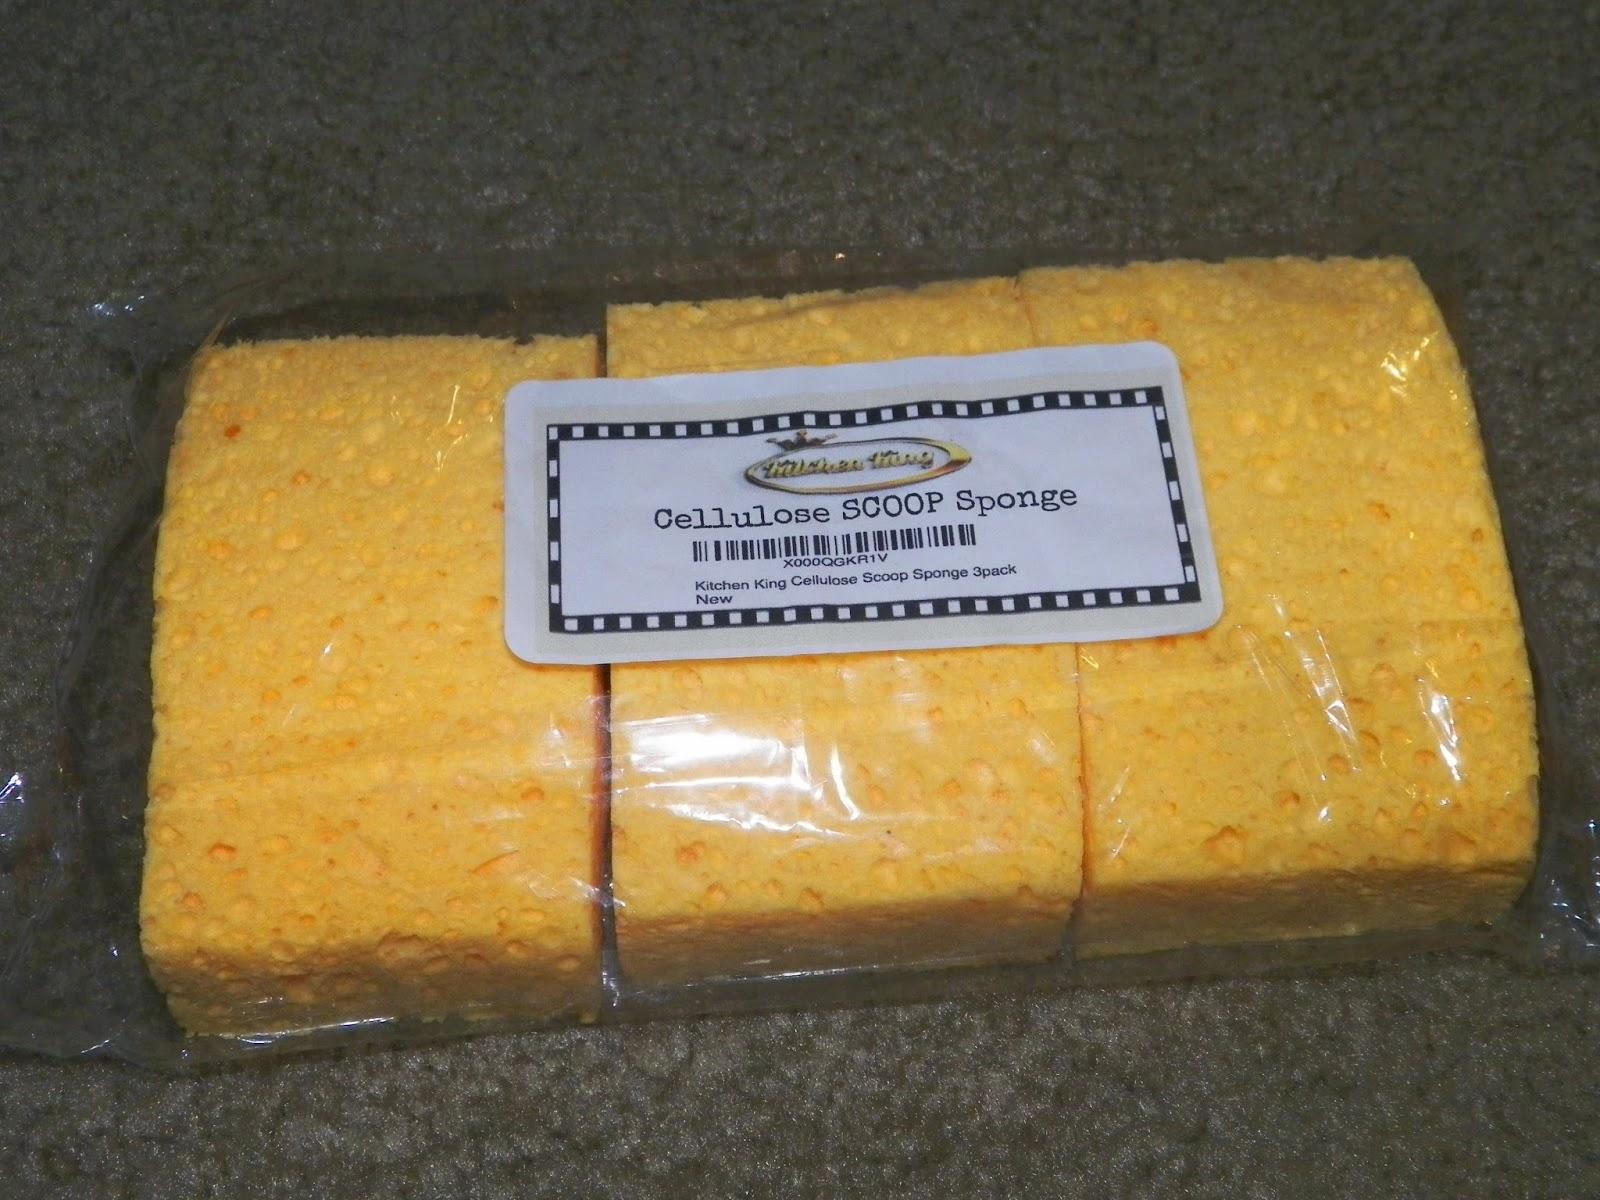 Cellulose_Scoop_Sponge.jpg